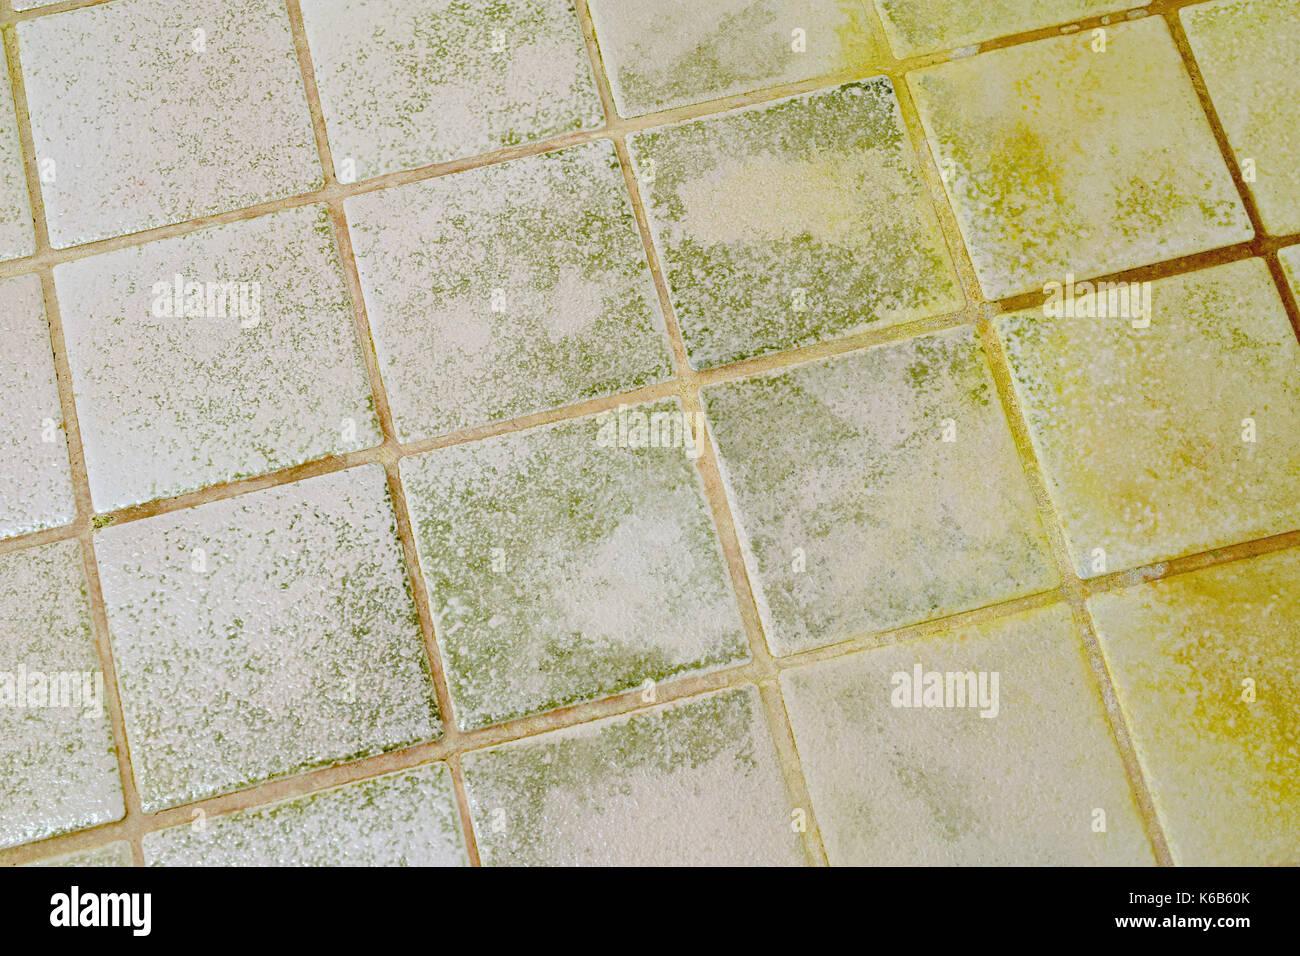 https www alamy com mold on the bathroom tile floor image158827443 html